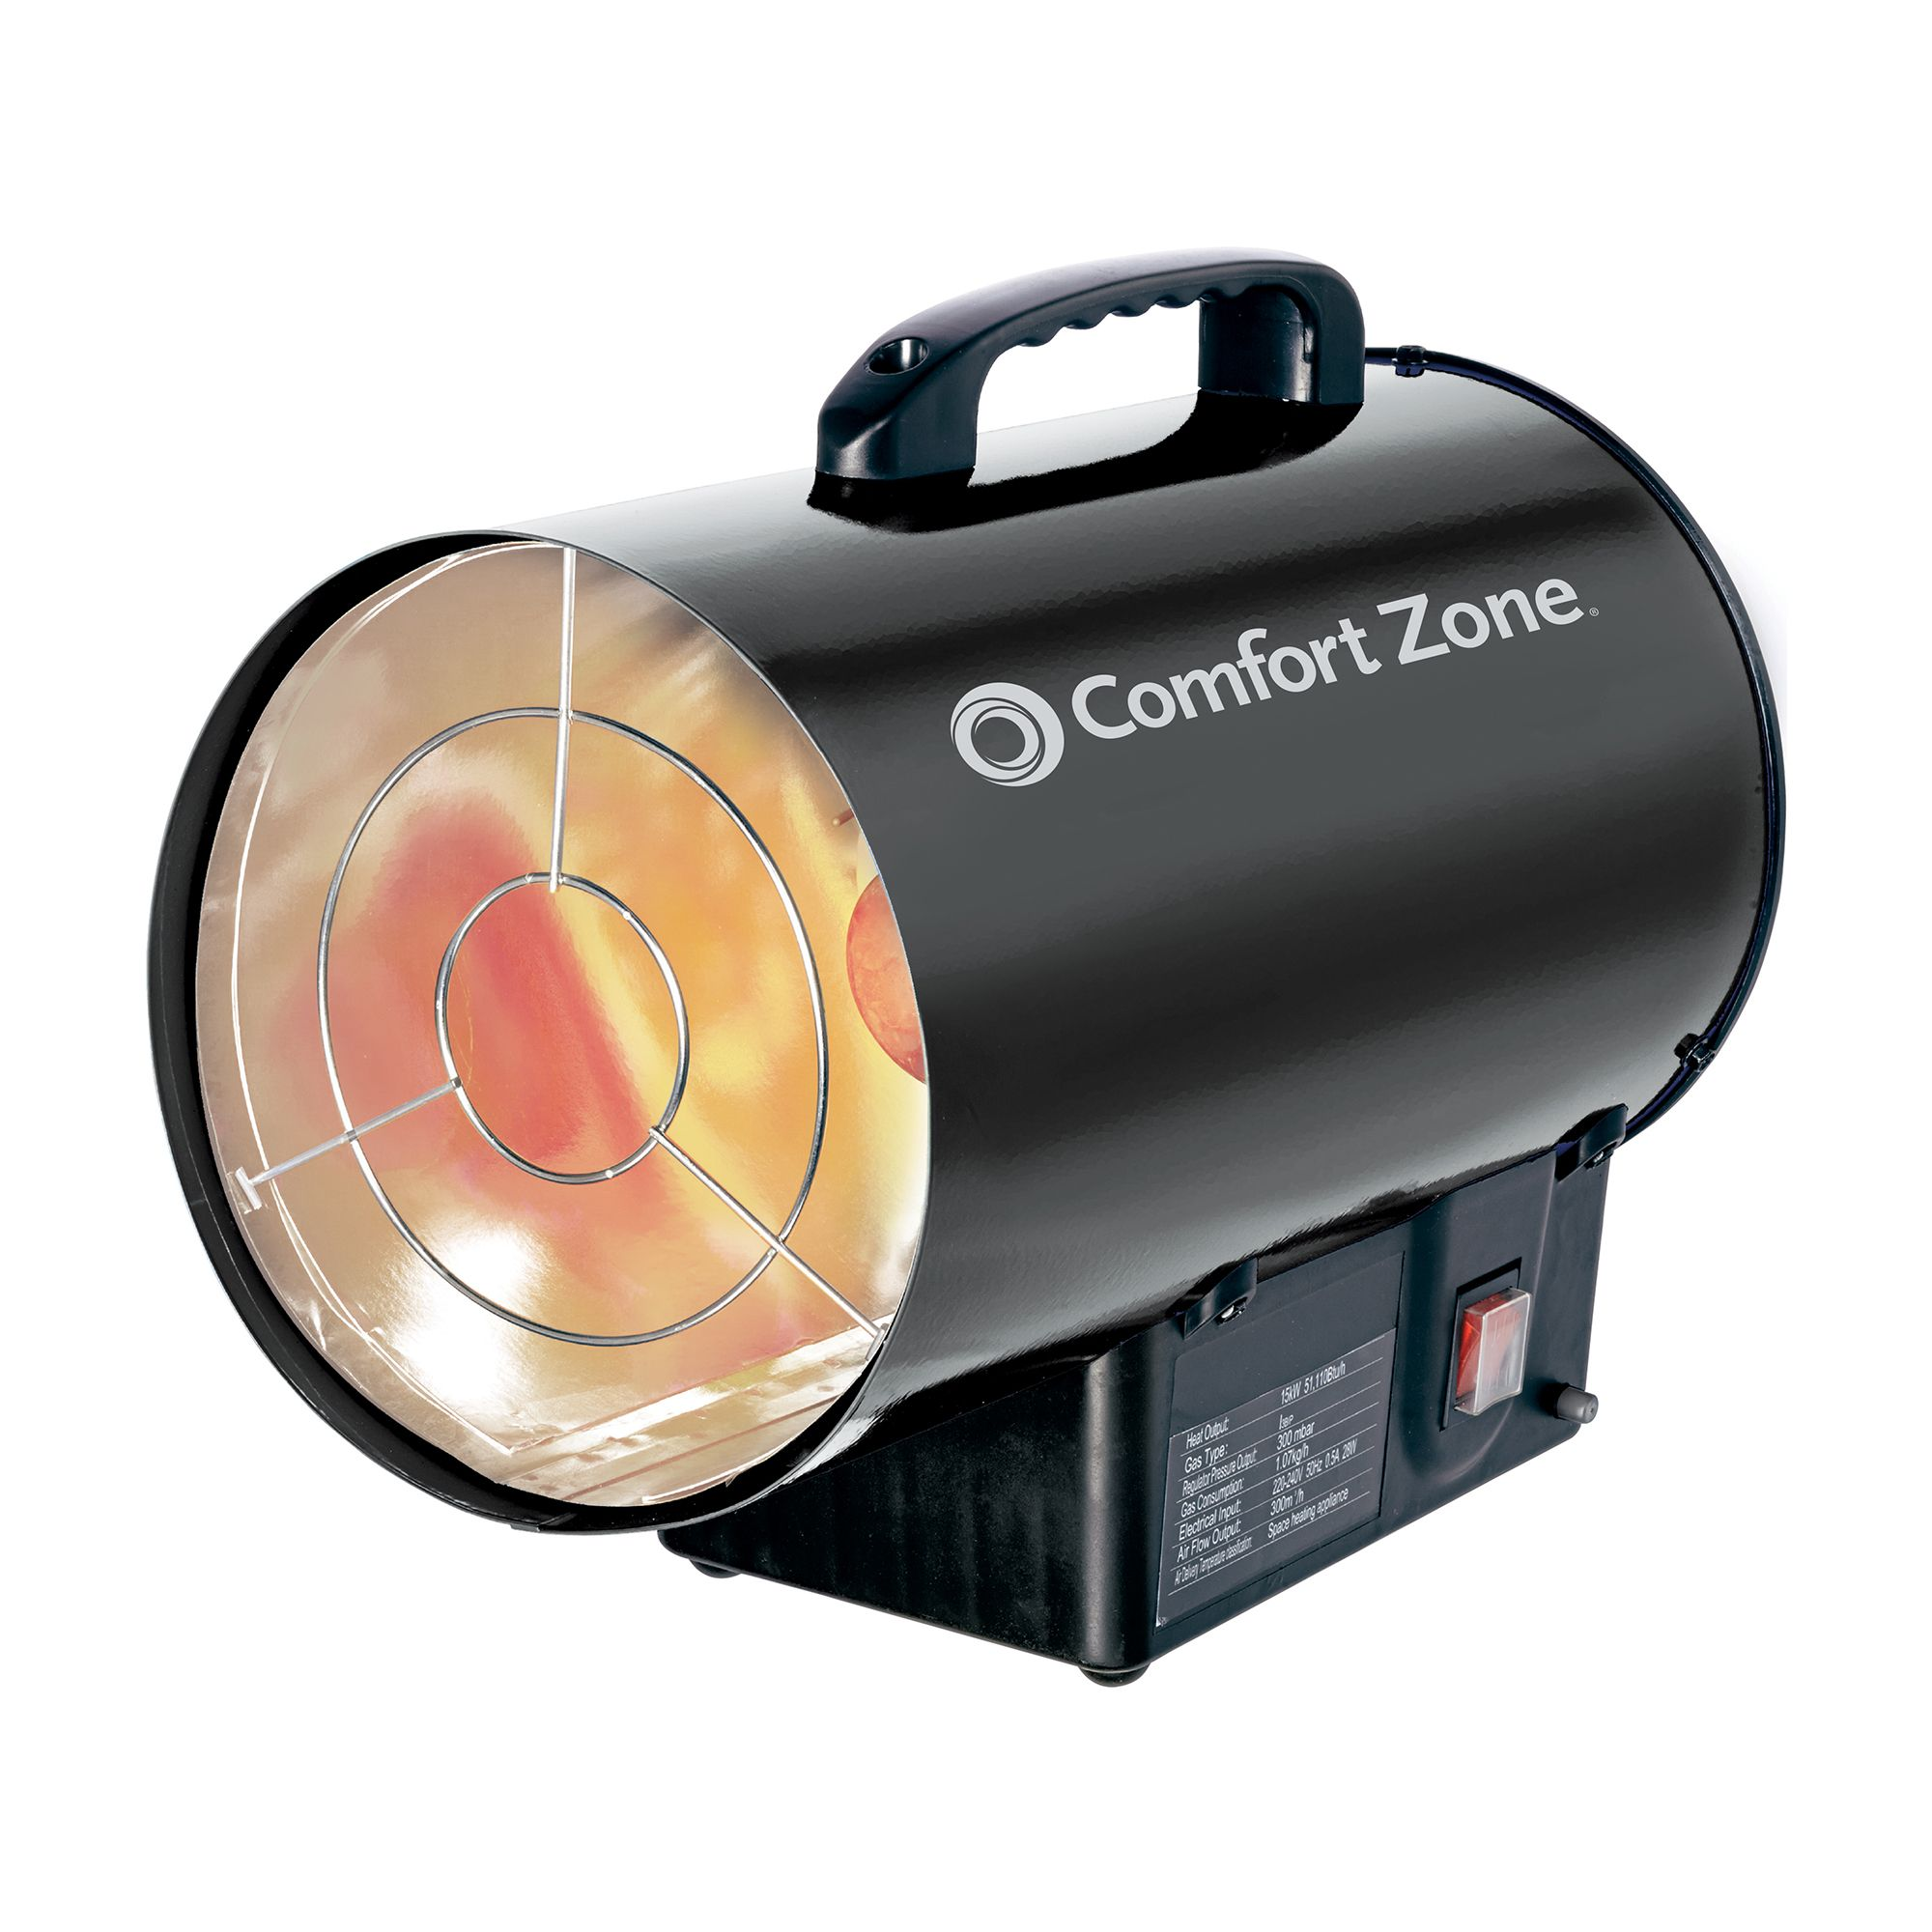 CZPP100 Radiant Propane Portable Forced Air Heater, Black